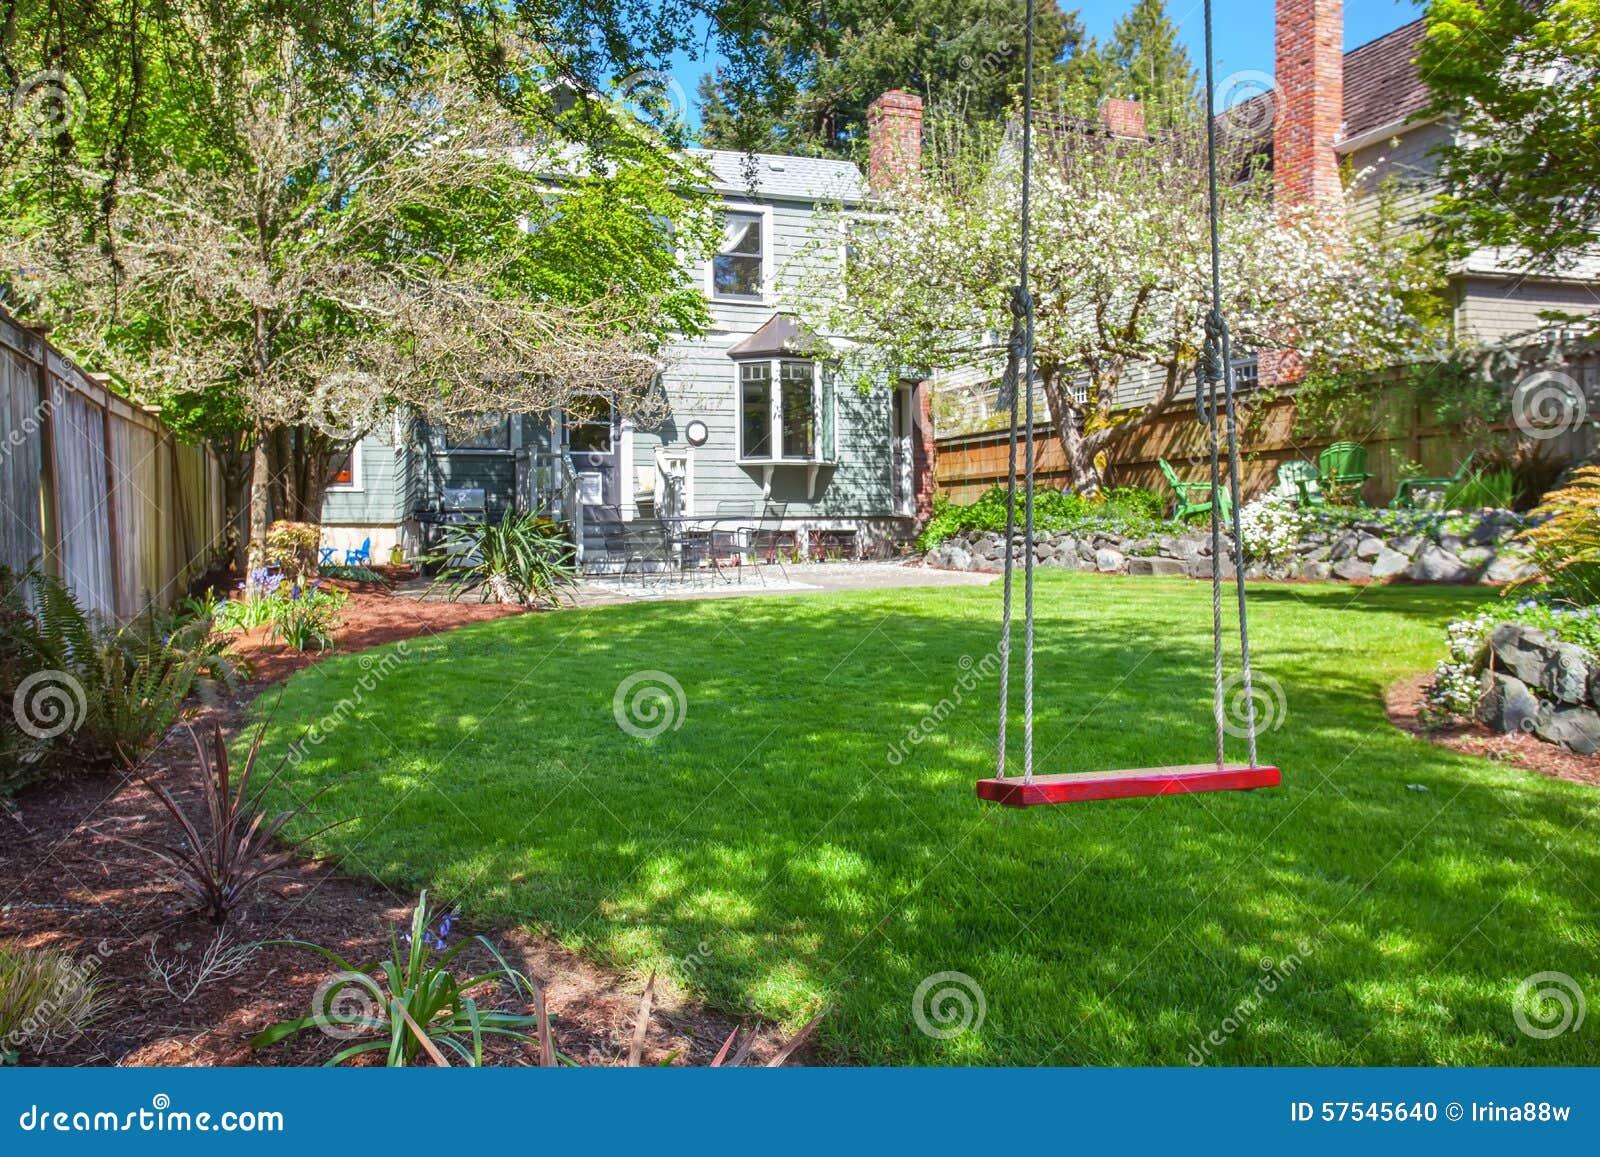 Perfect Backyard Tree : Perfect back yard with tree swing, grass, and other beautiful greenery